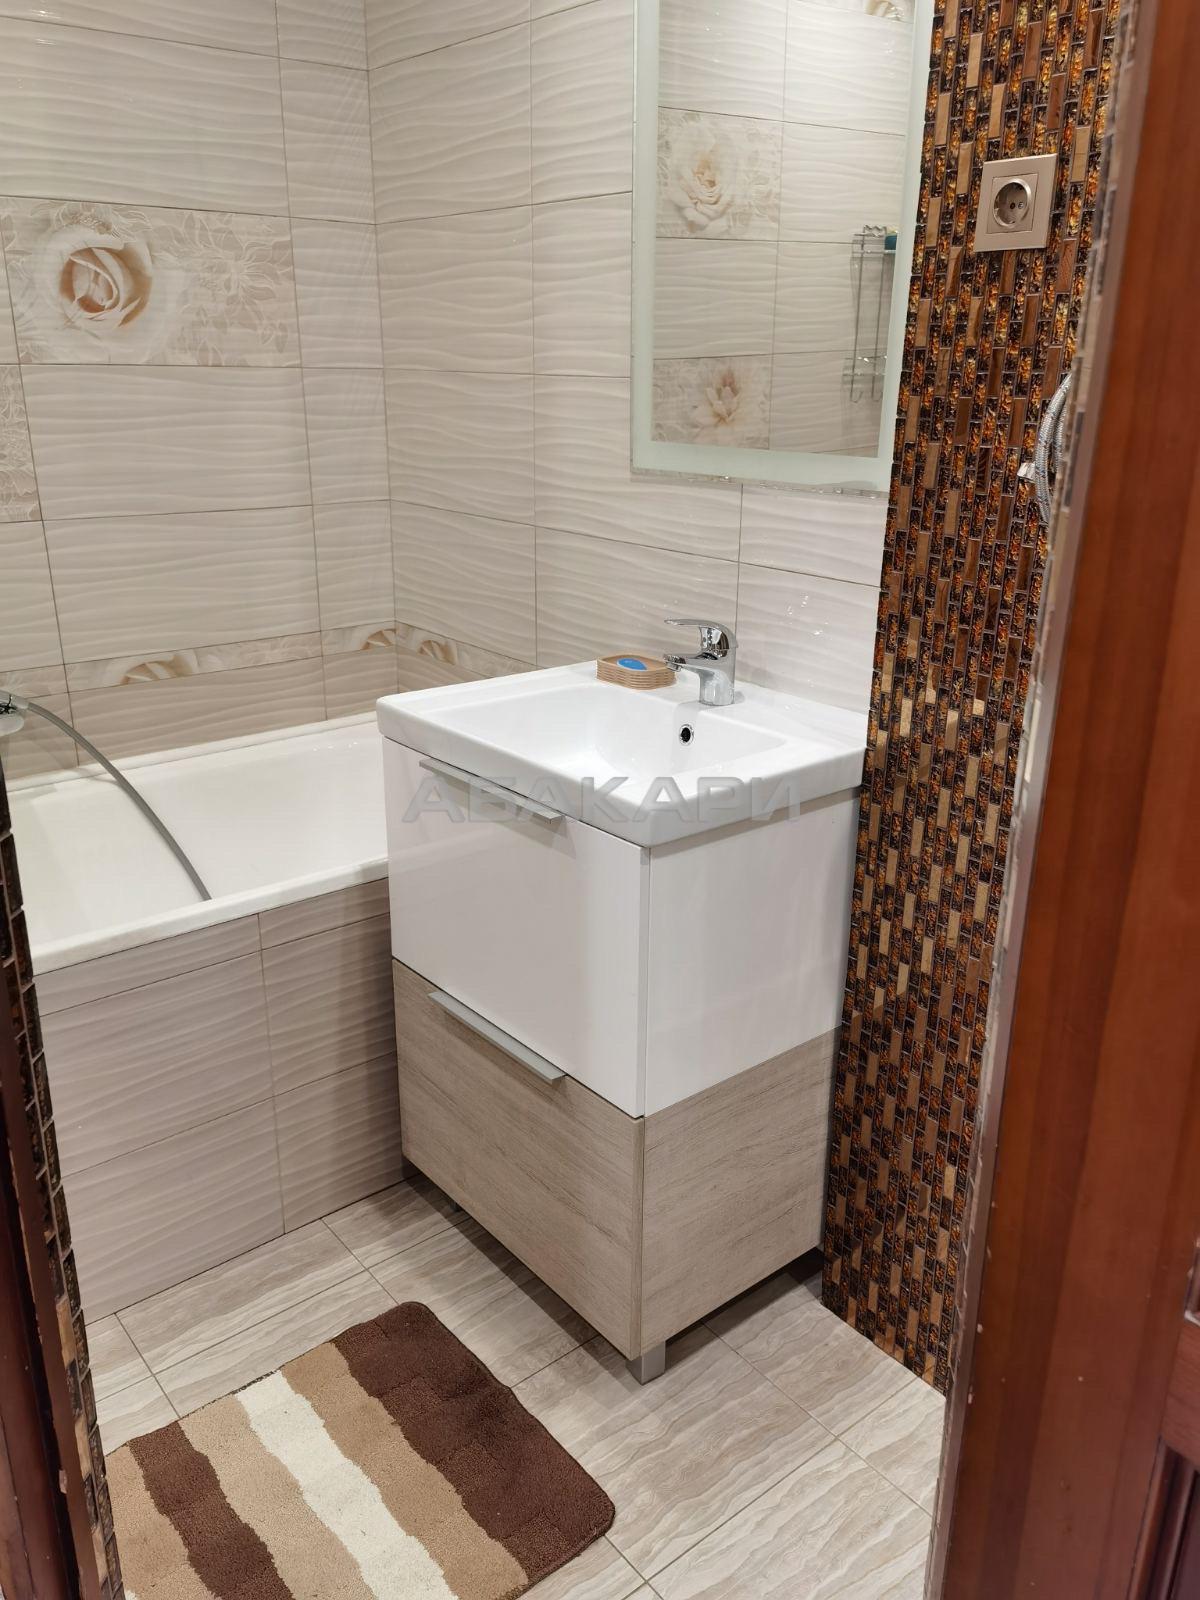 2к квартира Краснодарская улица, 7   24000   аренда в Красноярске фото 8